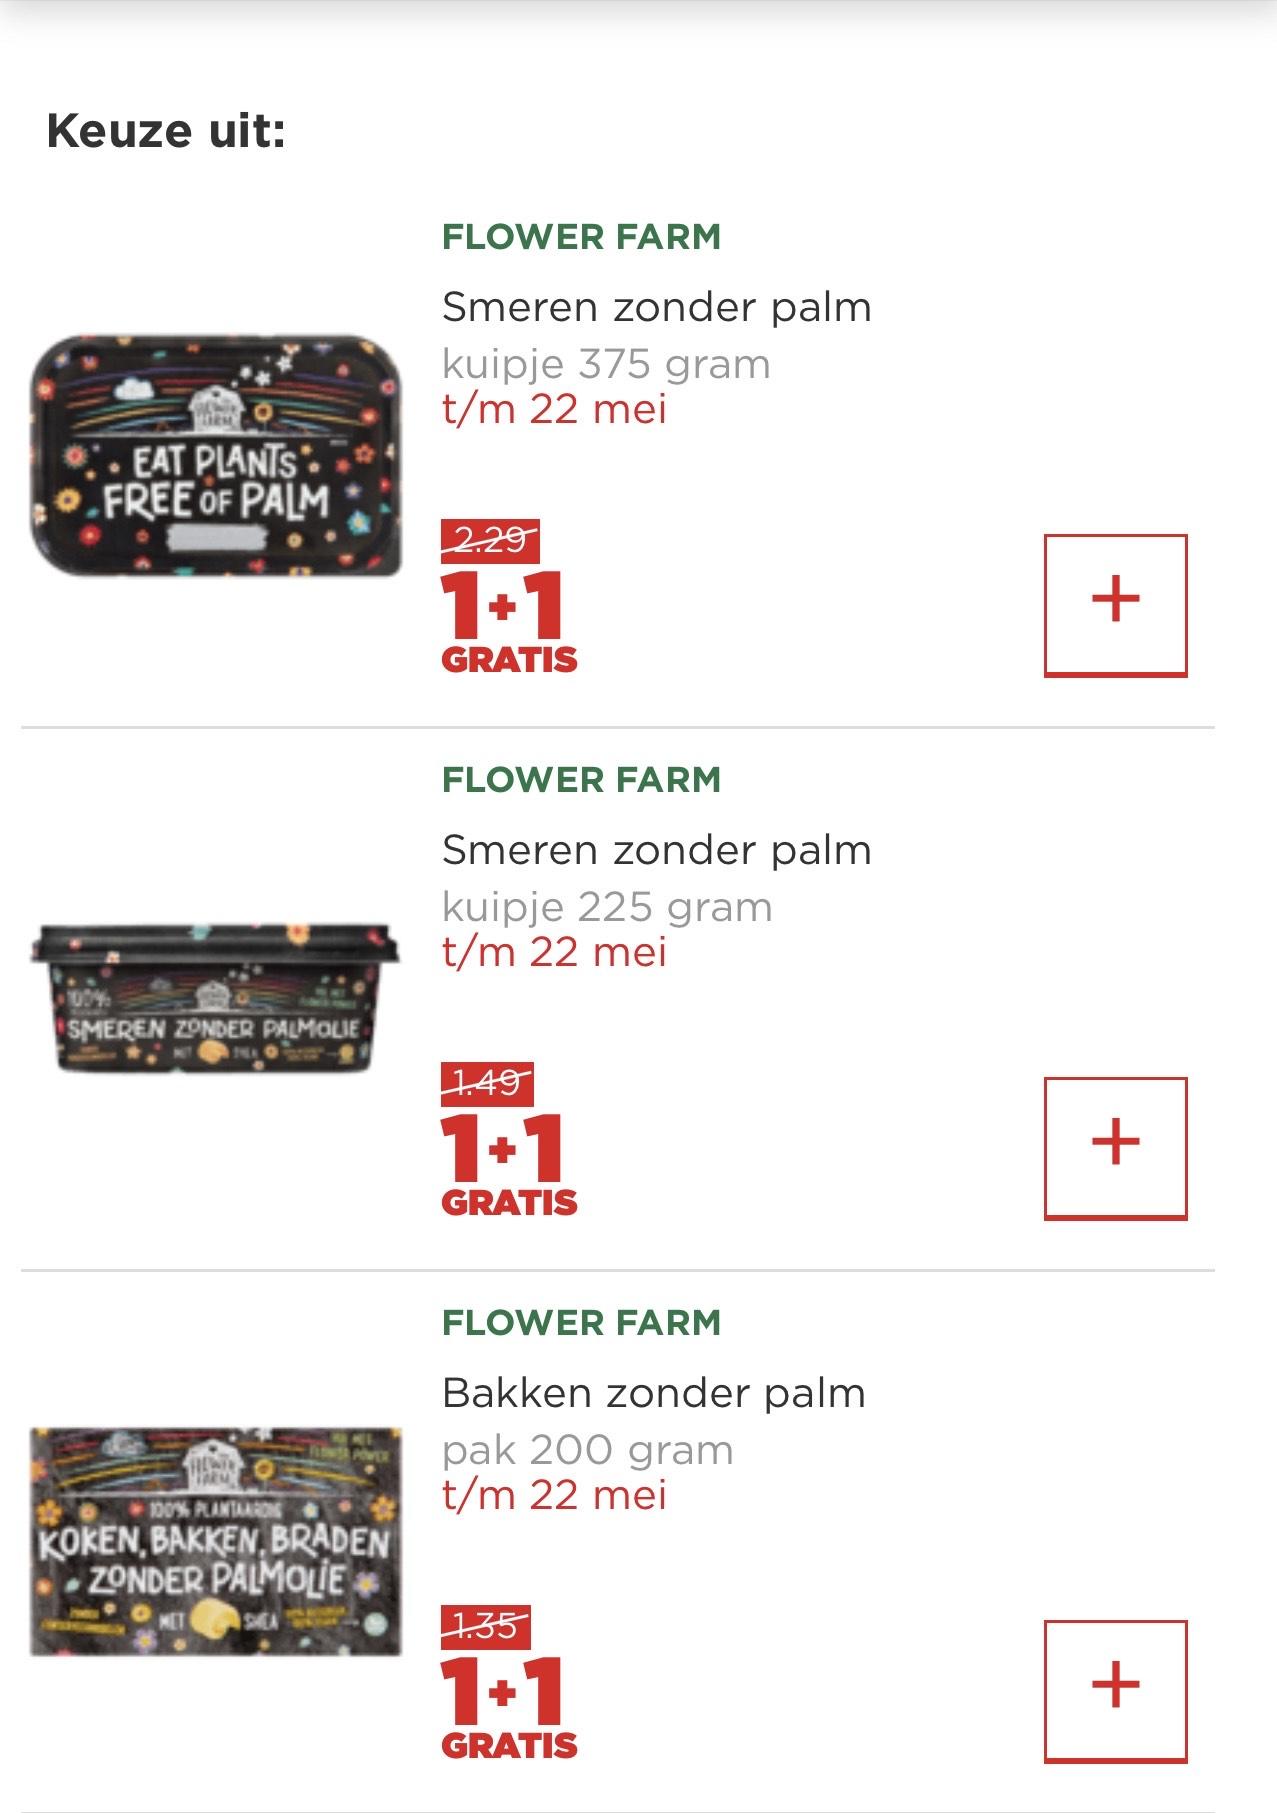 Flower farm 1+1 bij Plus